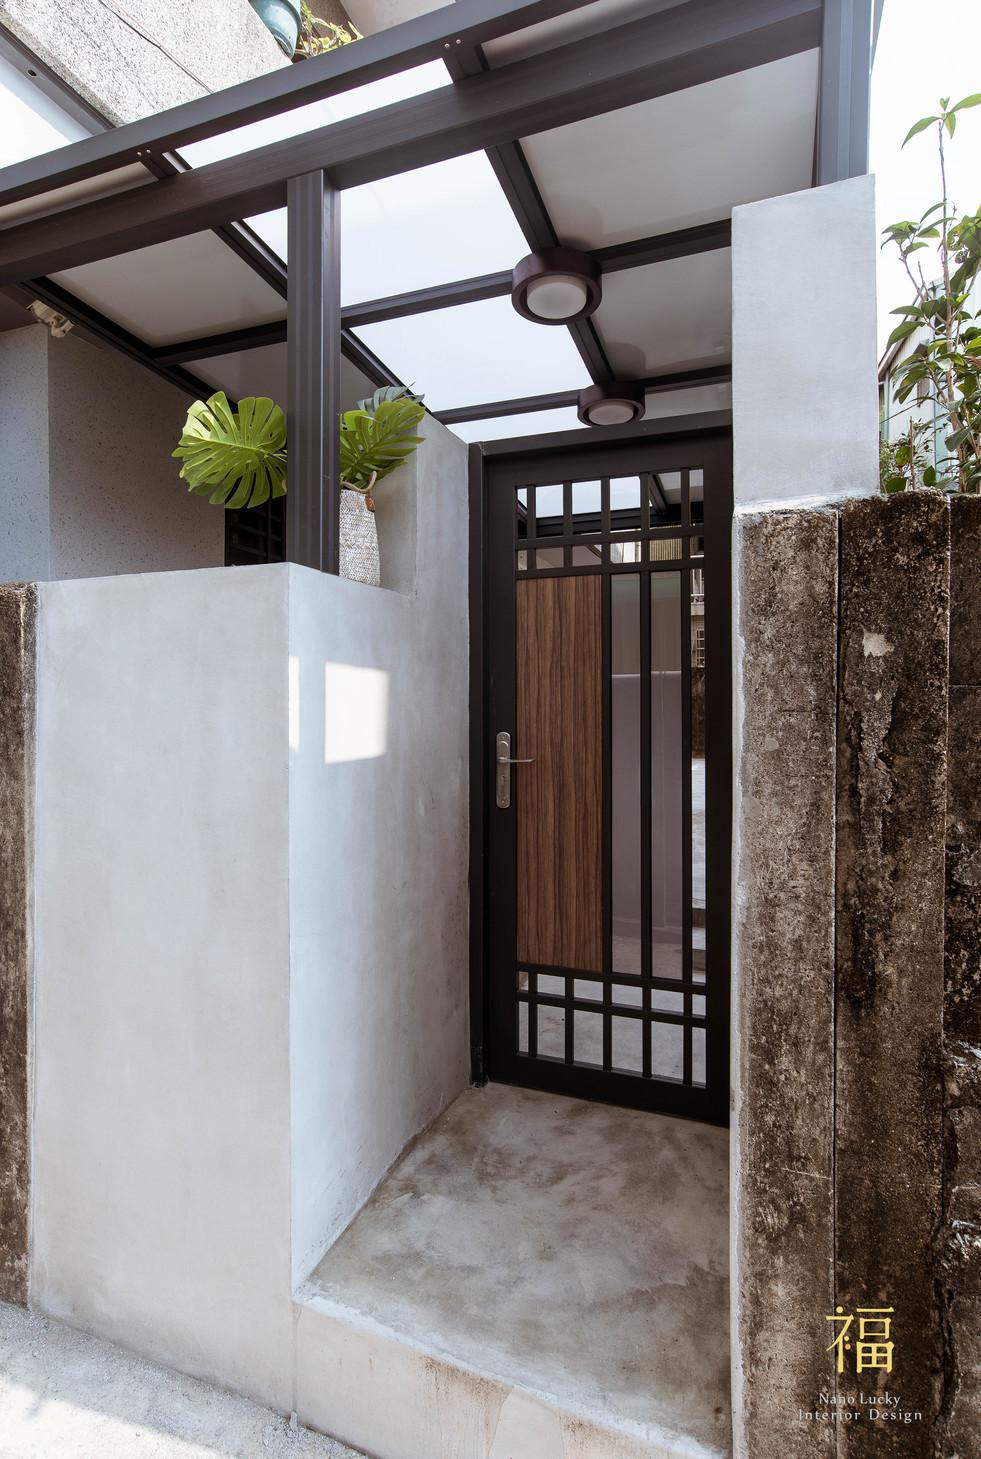 Nanolucky小福砌空間設計-小蘋果之家-建築設計-舊屋翻新-外觀設計修整